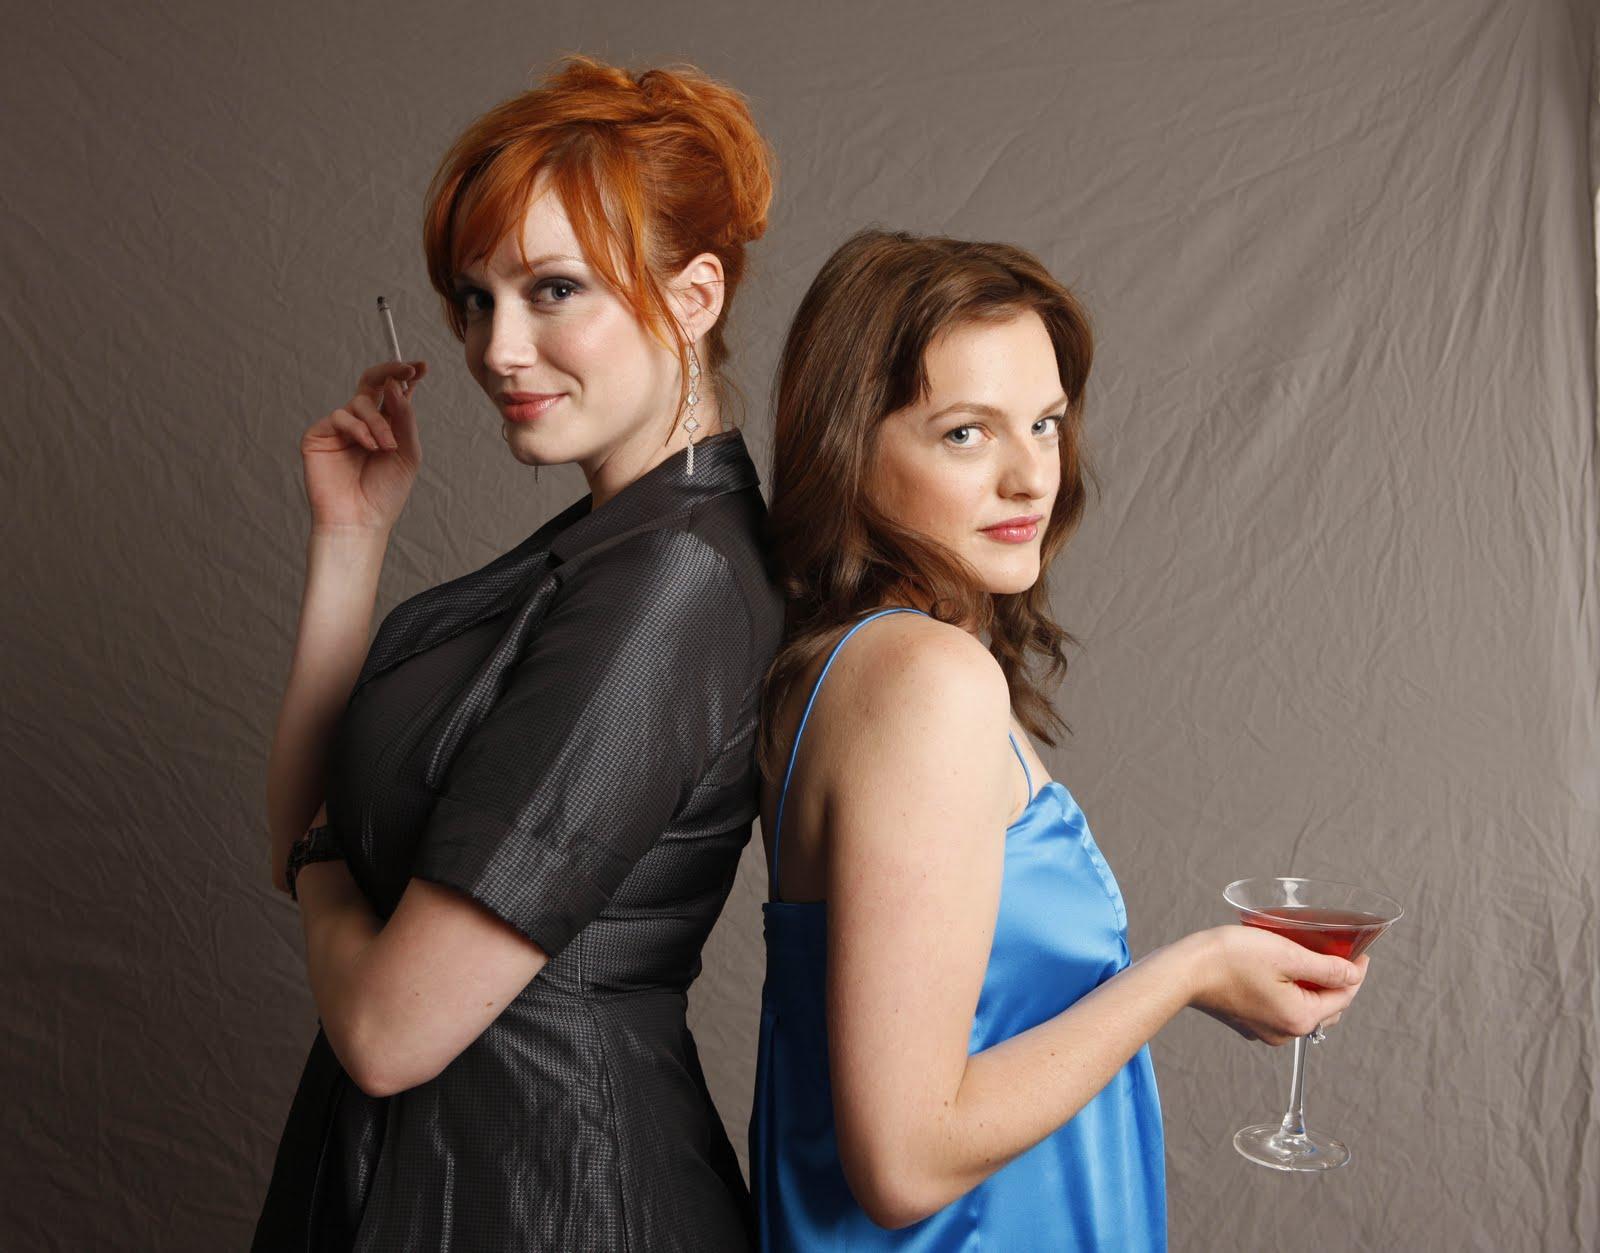 http://2.bp.blogspot.com/-p9SuPL-fon4/TnIYYzObiXI/AAAAAAAADBc/gIN9xAXUzkM/s1600/Elisabeth_Moss_Mad_Men_Emmy_Awards_Nominee_HD_Wallpaper_Vvallpaper.Net_2.jpg